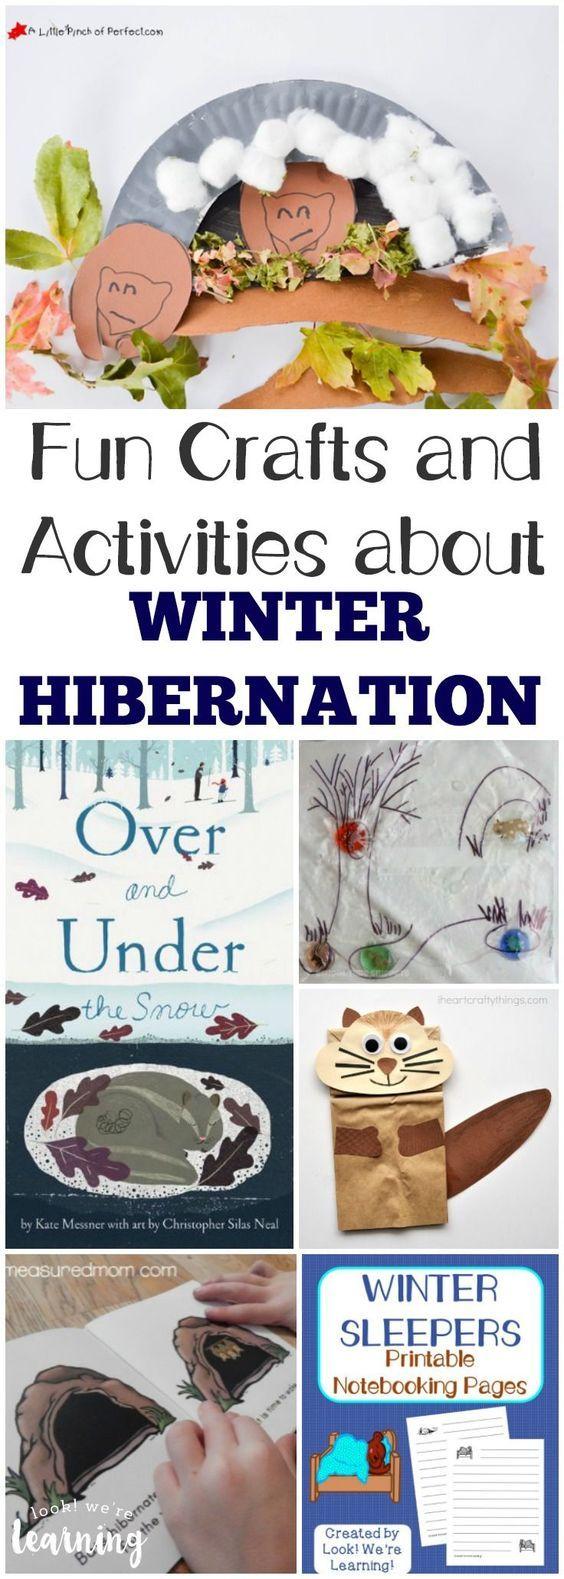 Fun Activities About Hibernation For Kids Hibernation Crafts Winter Activities For Kids Winter Crafts Preschool [ 1579 x 564 Pixel ]